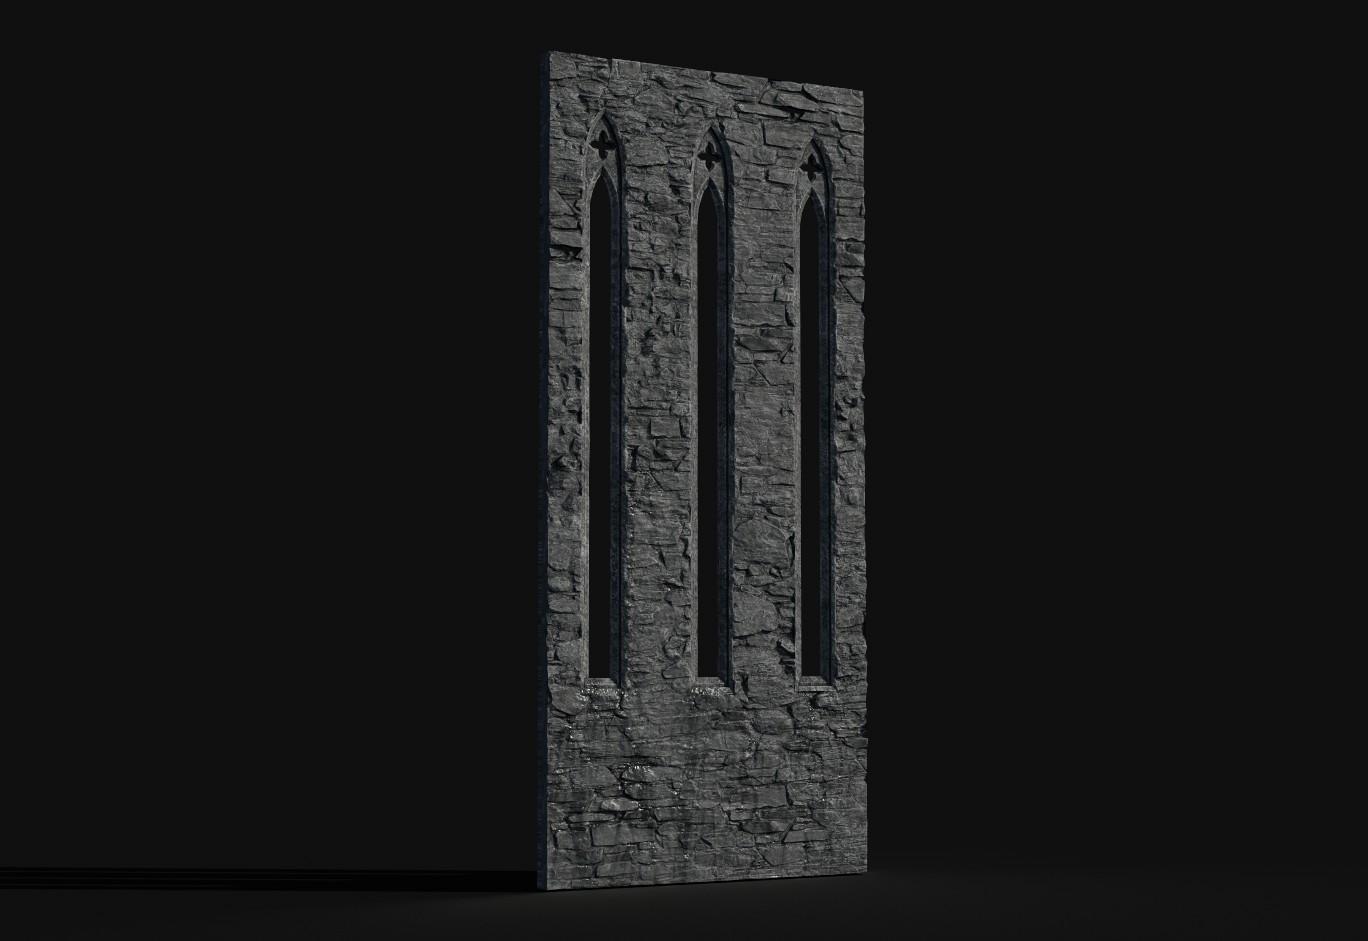 StoneCathedral_Windows_02.jpg